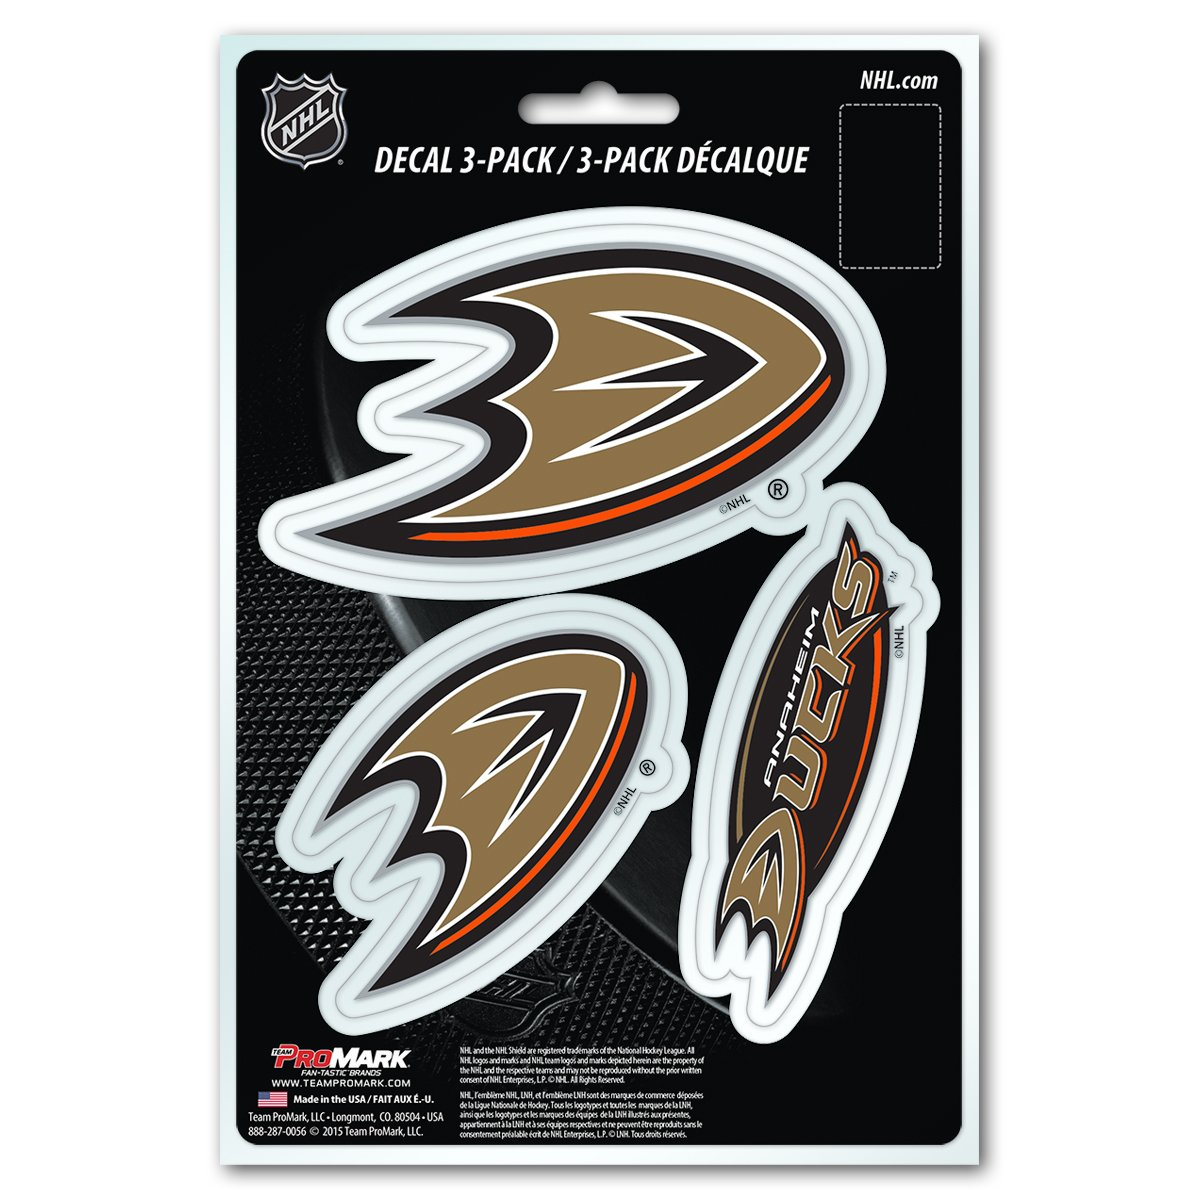 e2eb7c4e Amazon.com : NHL Anaheim Ducks Team Decal, 3-Pack : Sports & Outdoors